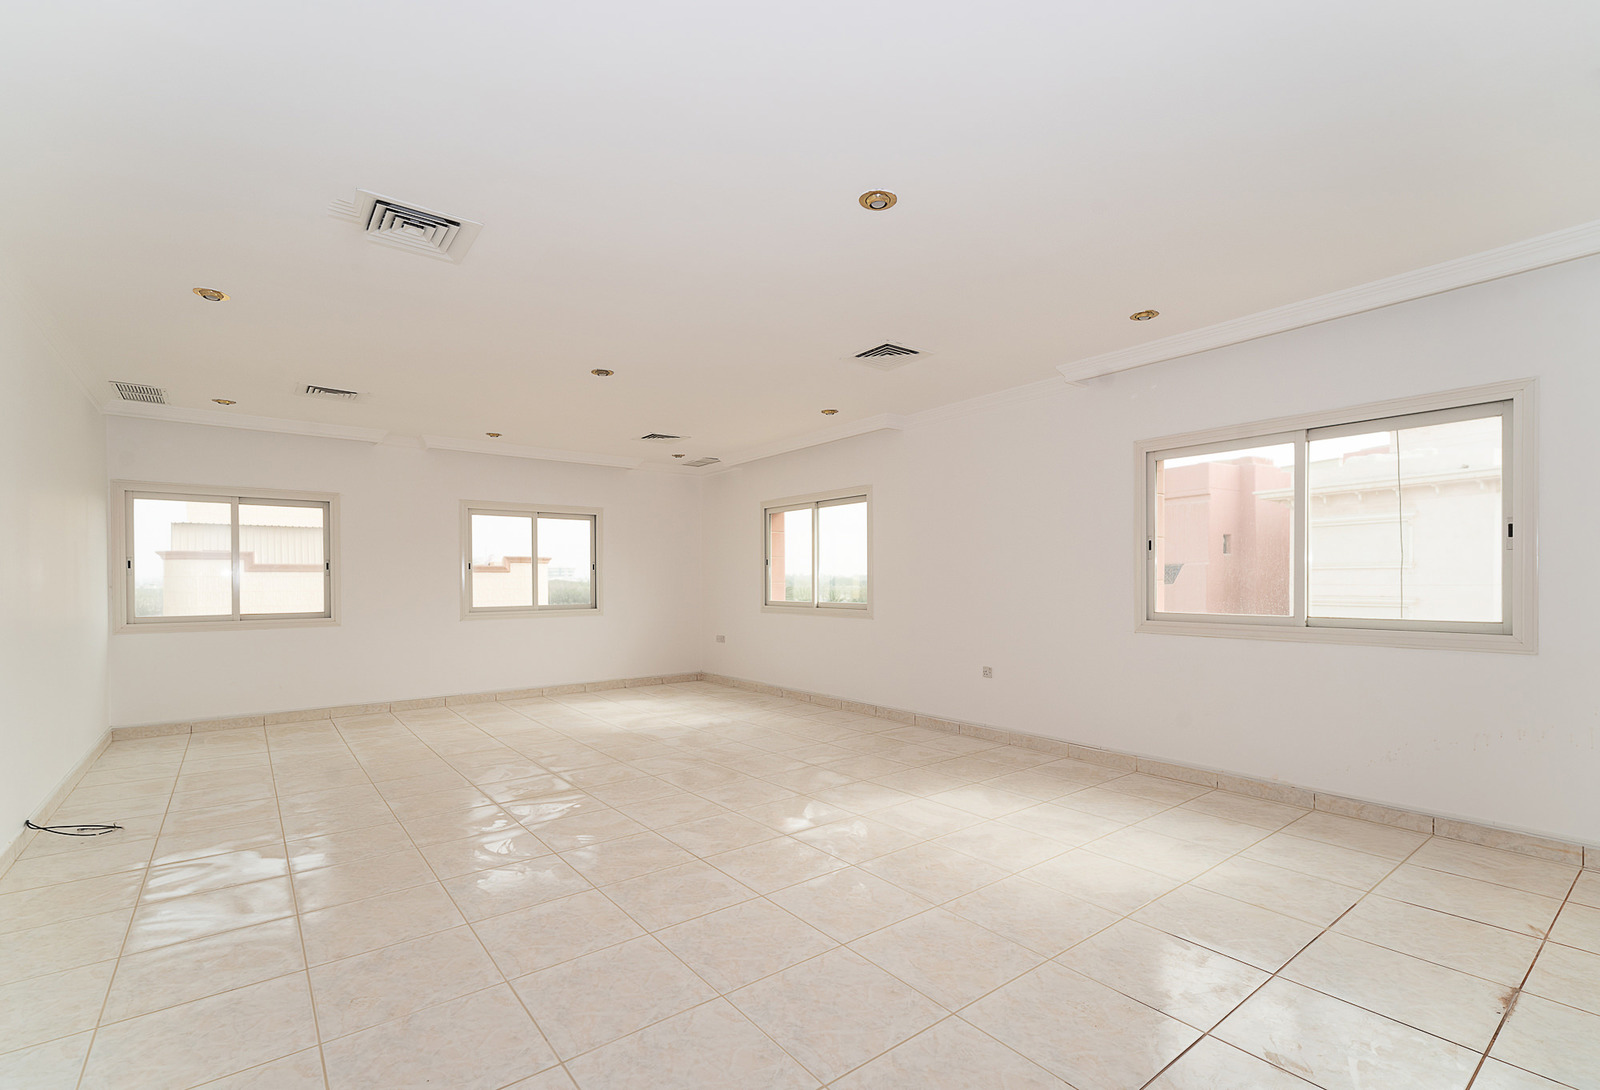 Shuhaha – very large, unfurnished, five bedroom floor